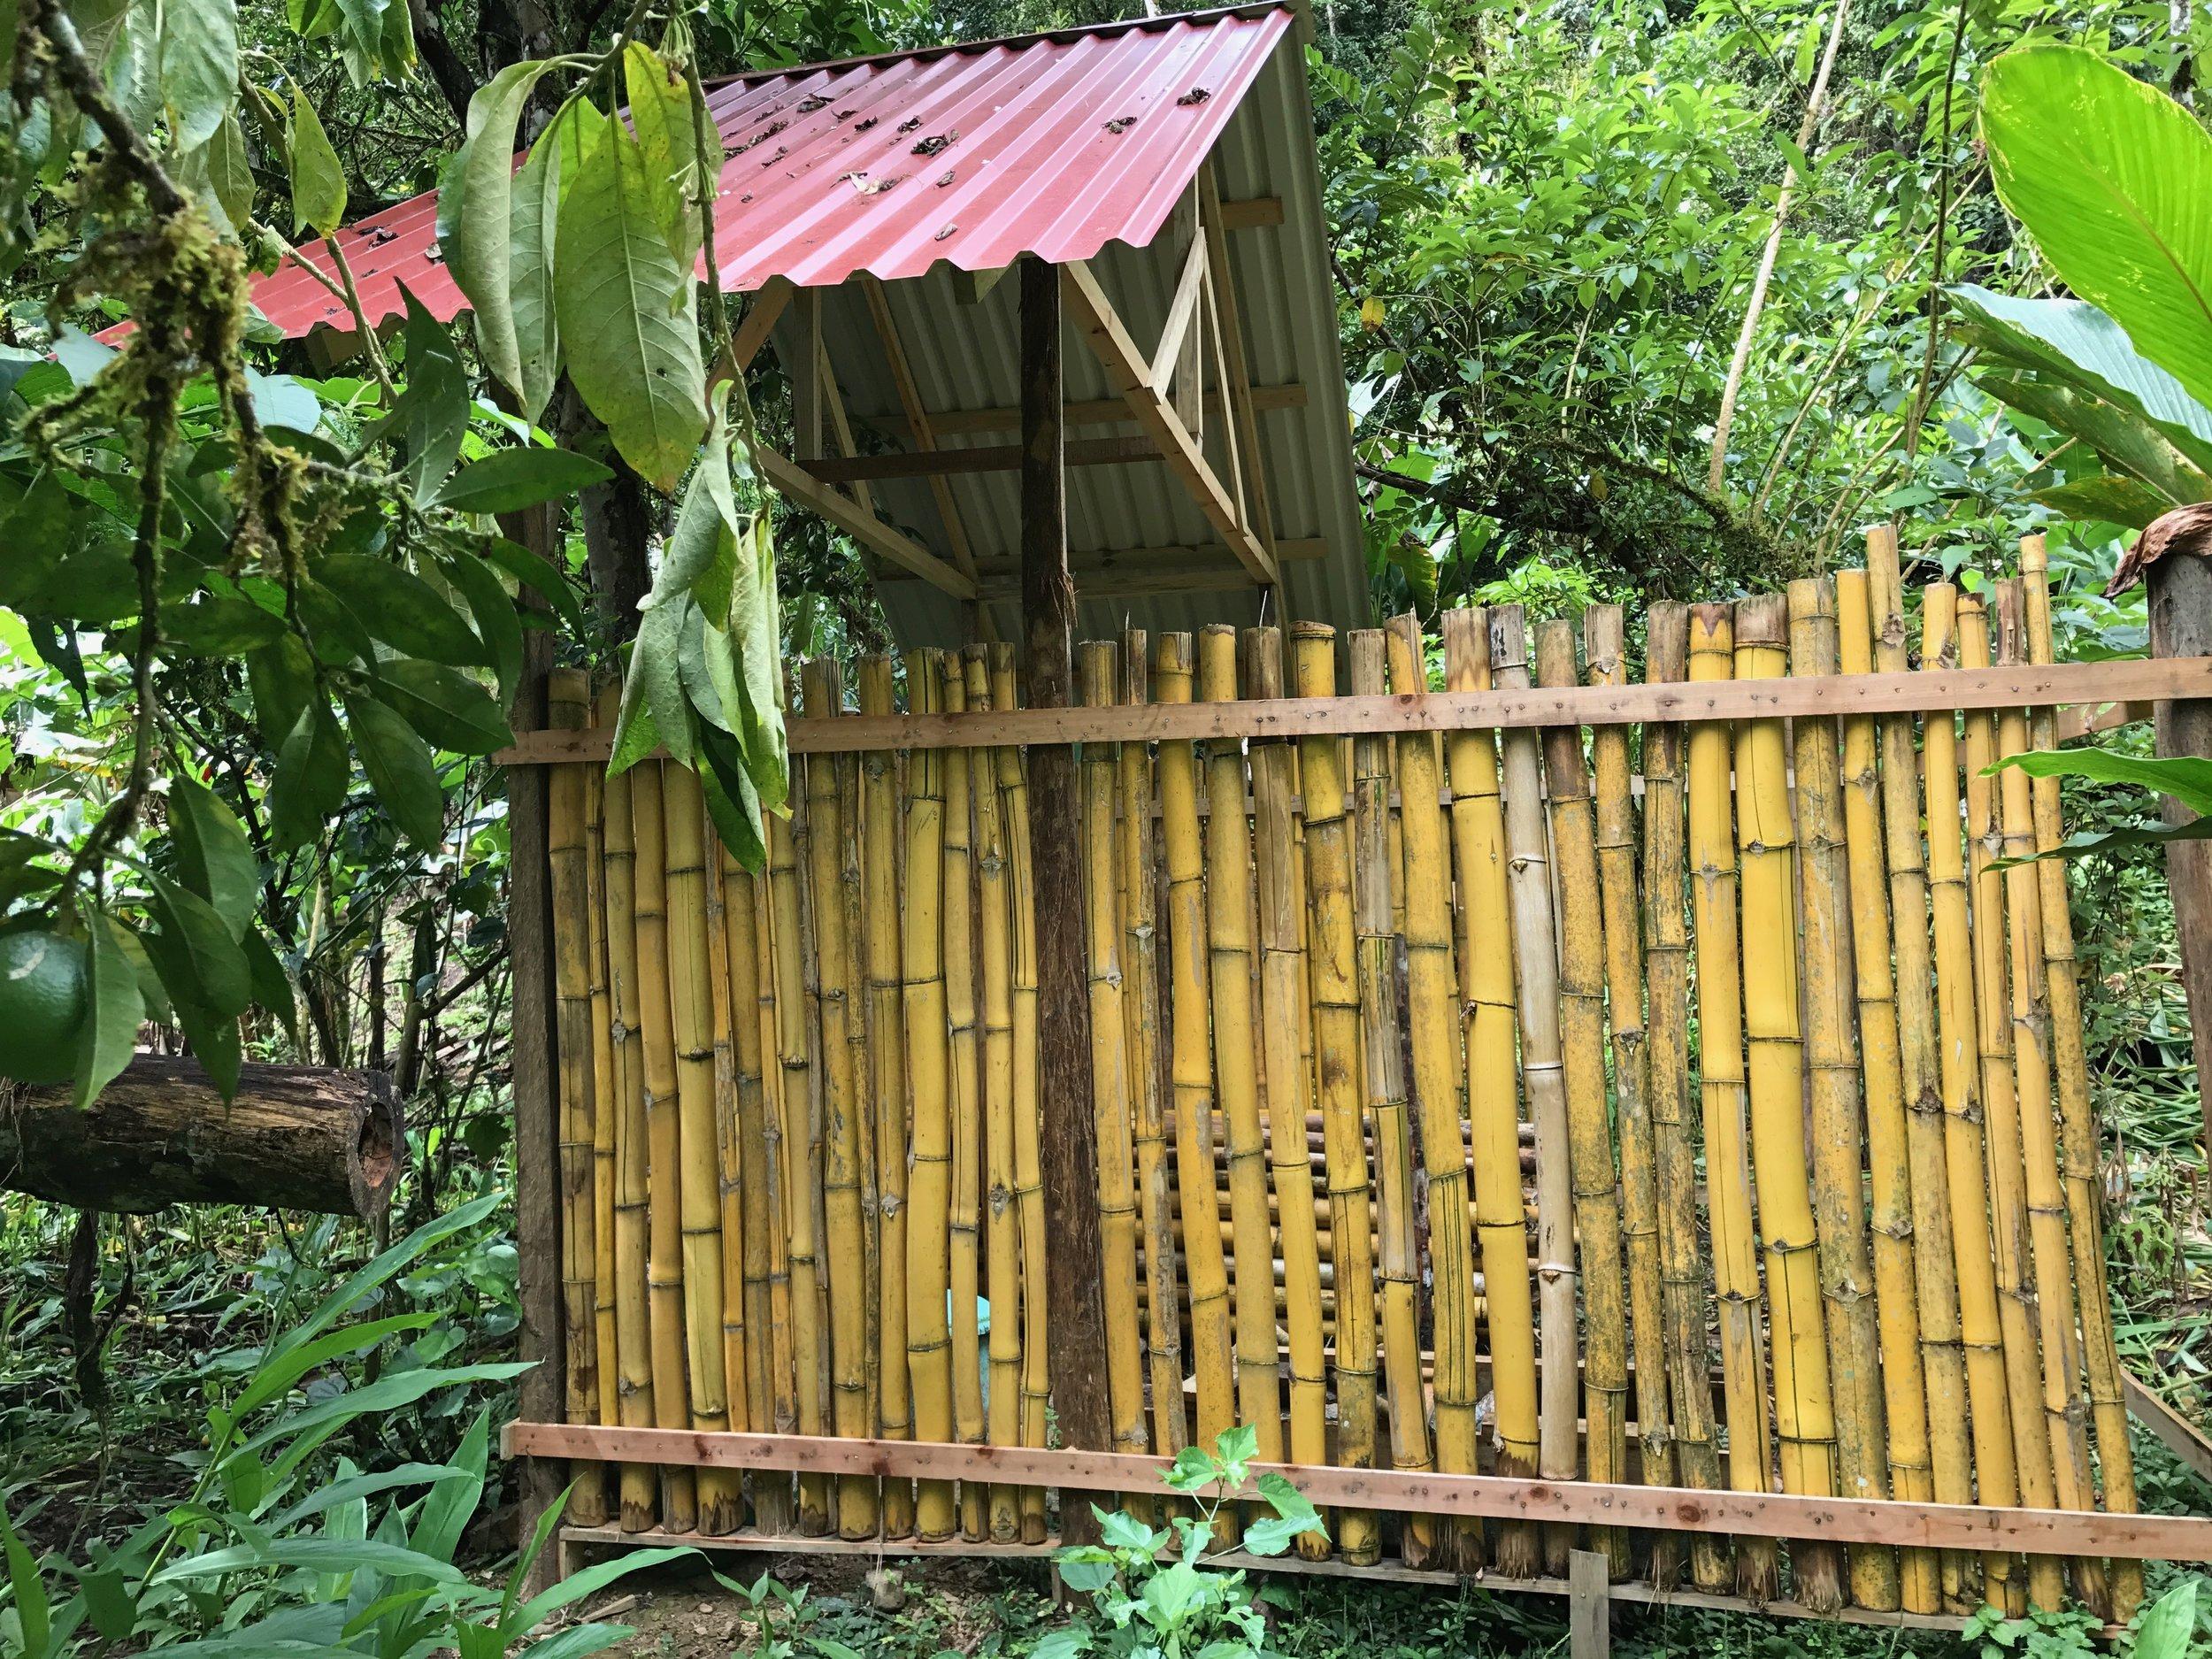 The Bamboo Bathroom.